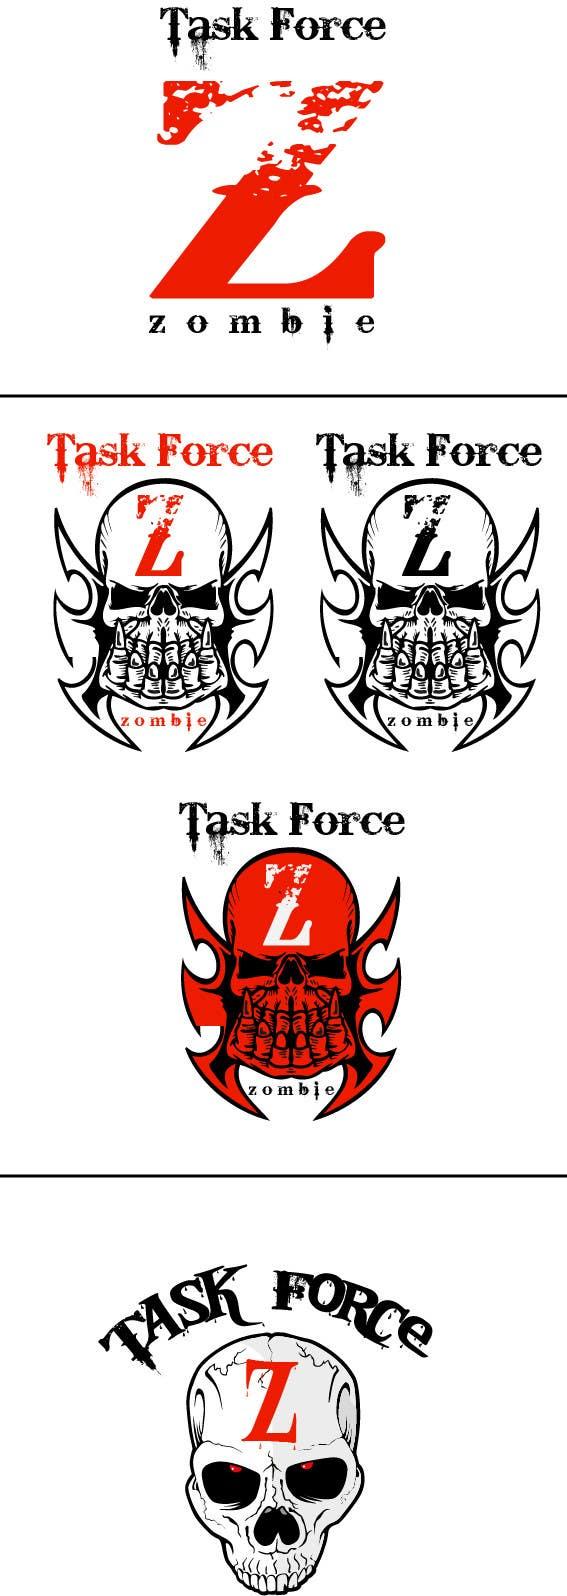 Bài tham dự cuộc thi #                                        69                                      cho                                         Design a Logo for Tactical training company